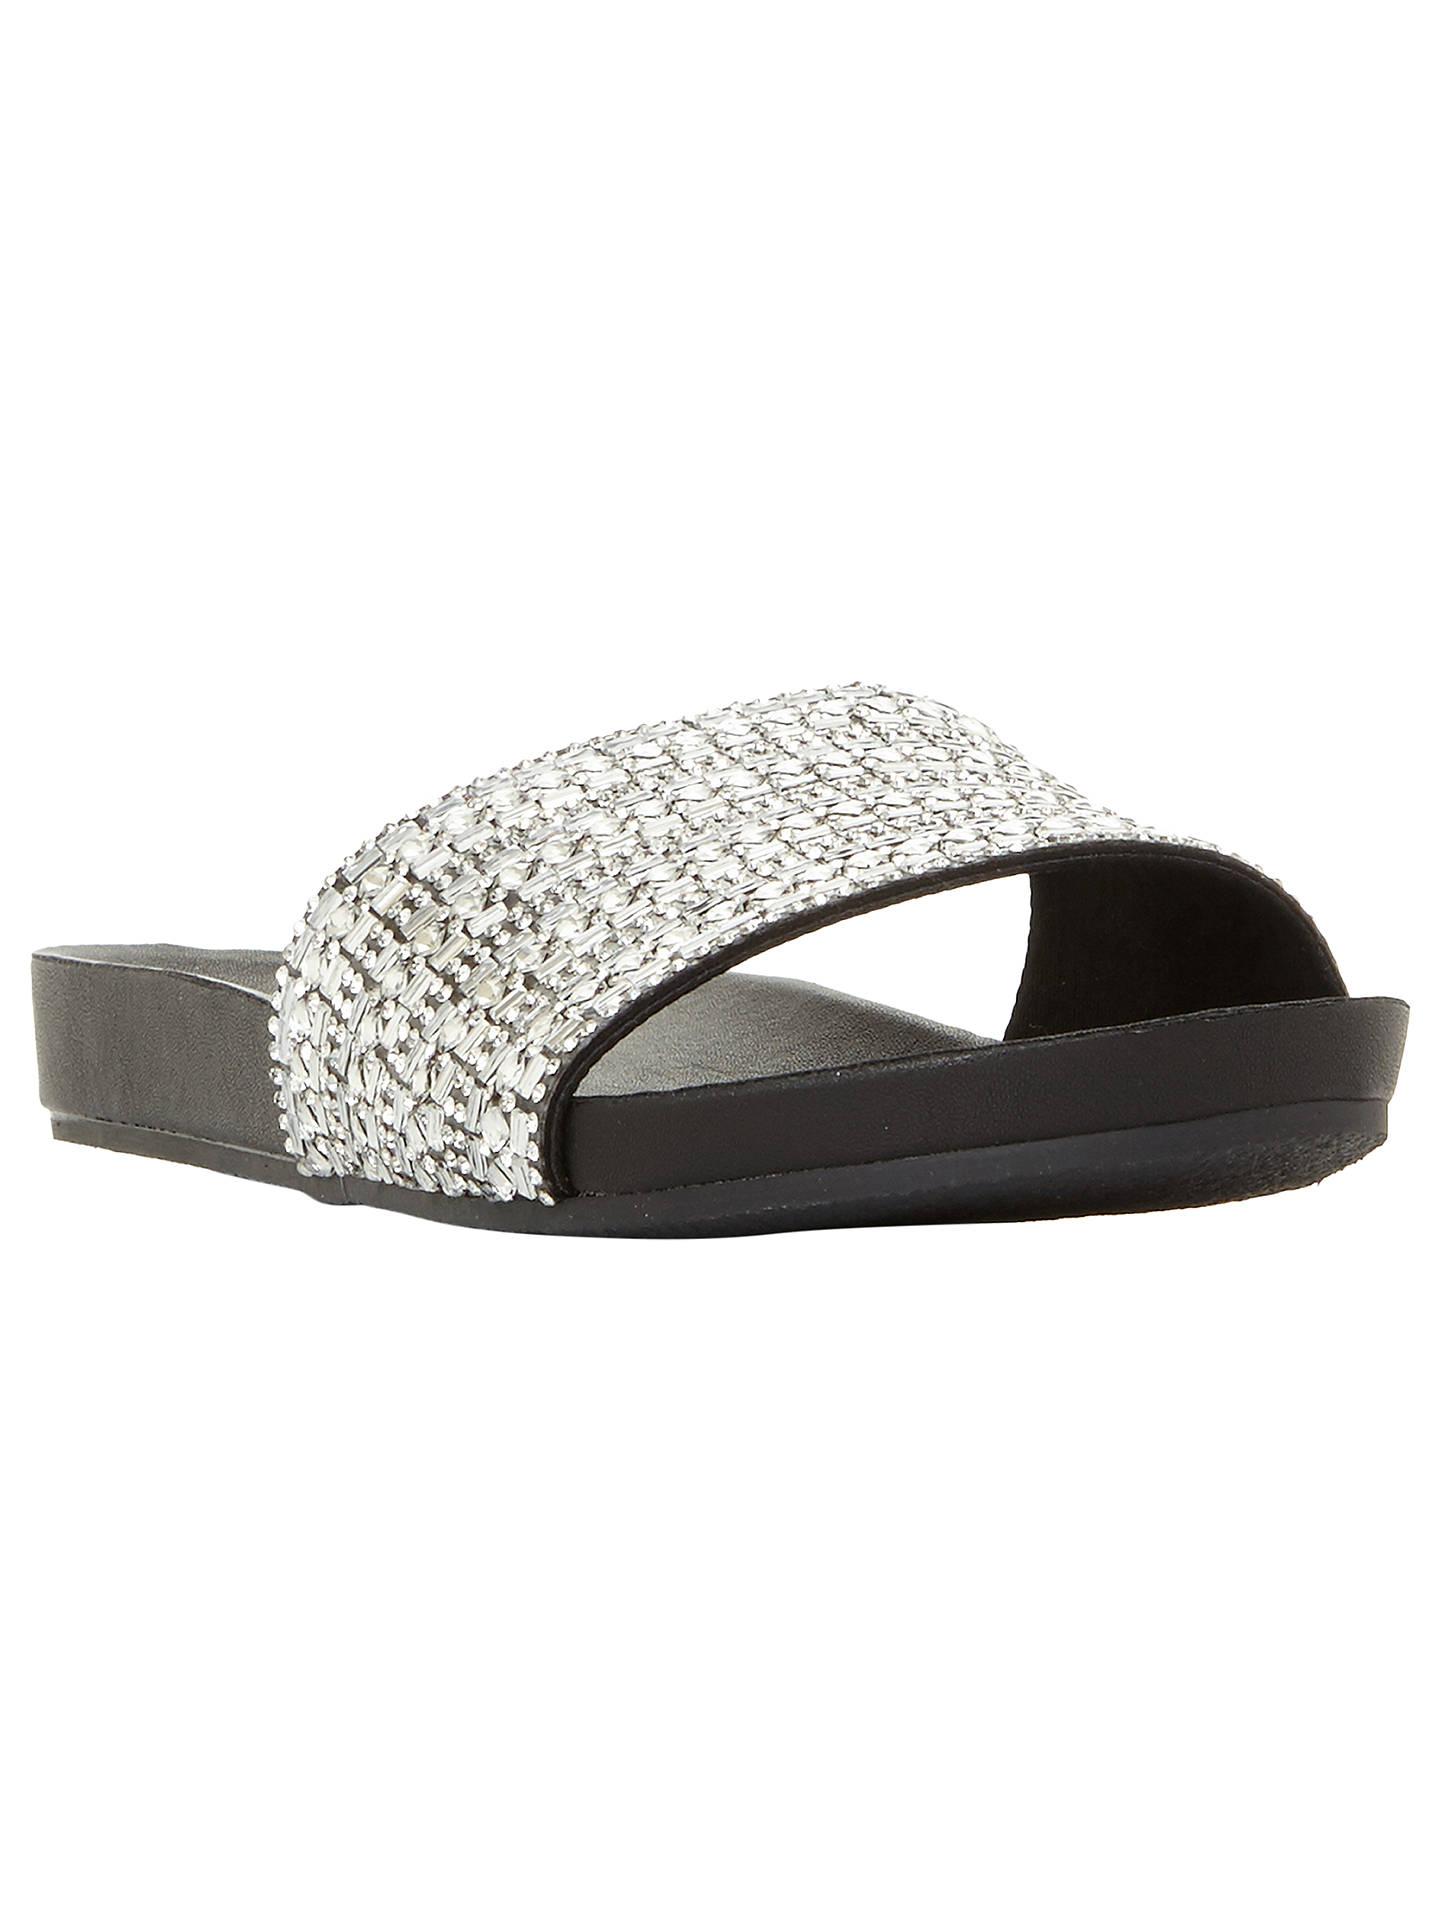 abcabb4650b Steve Madden Dazzle Slider Sandals at John Lewis   Partners